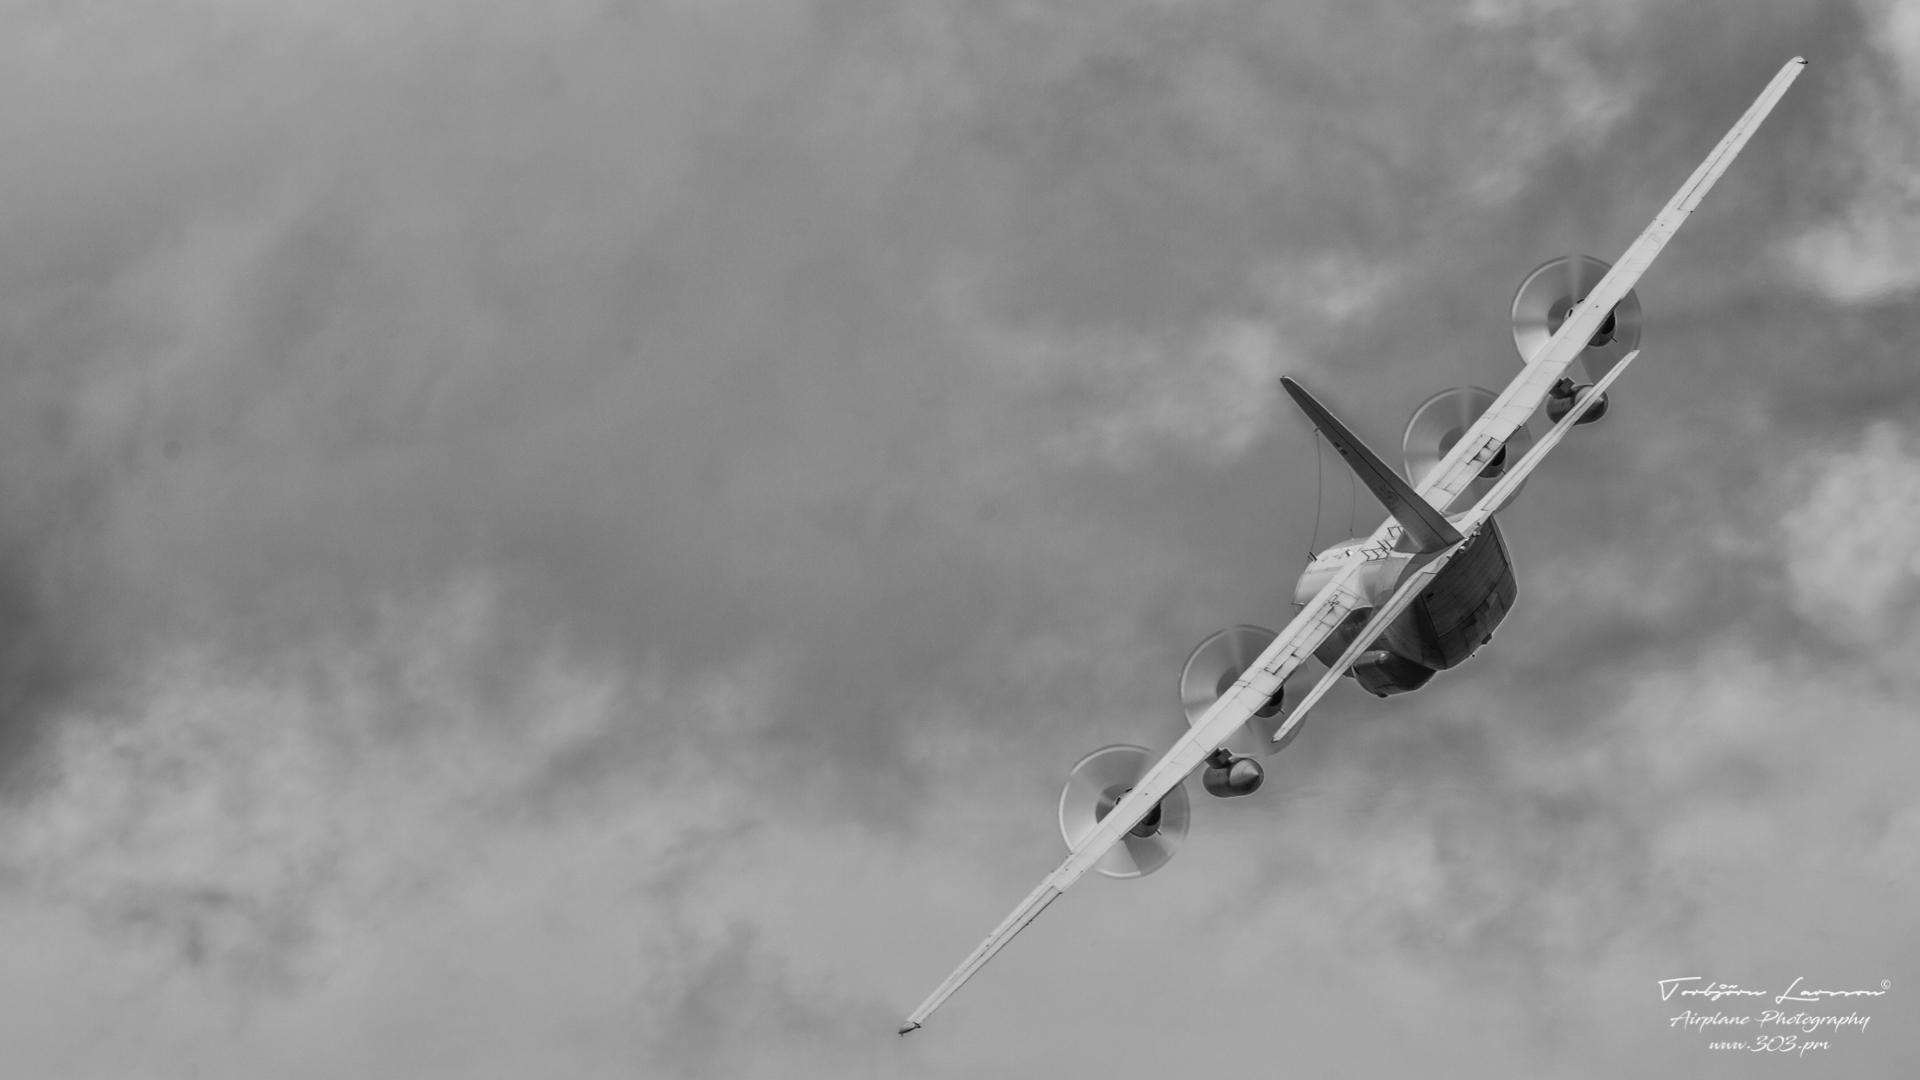 TBE_3072-Lockheed C-130 Hercules